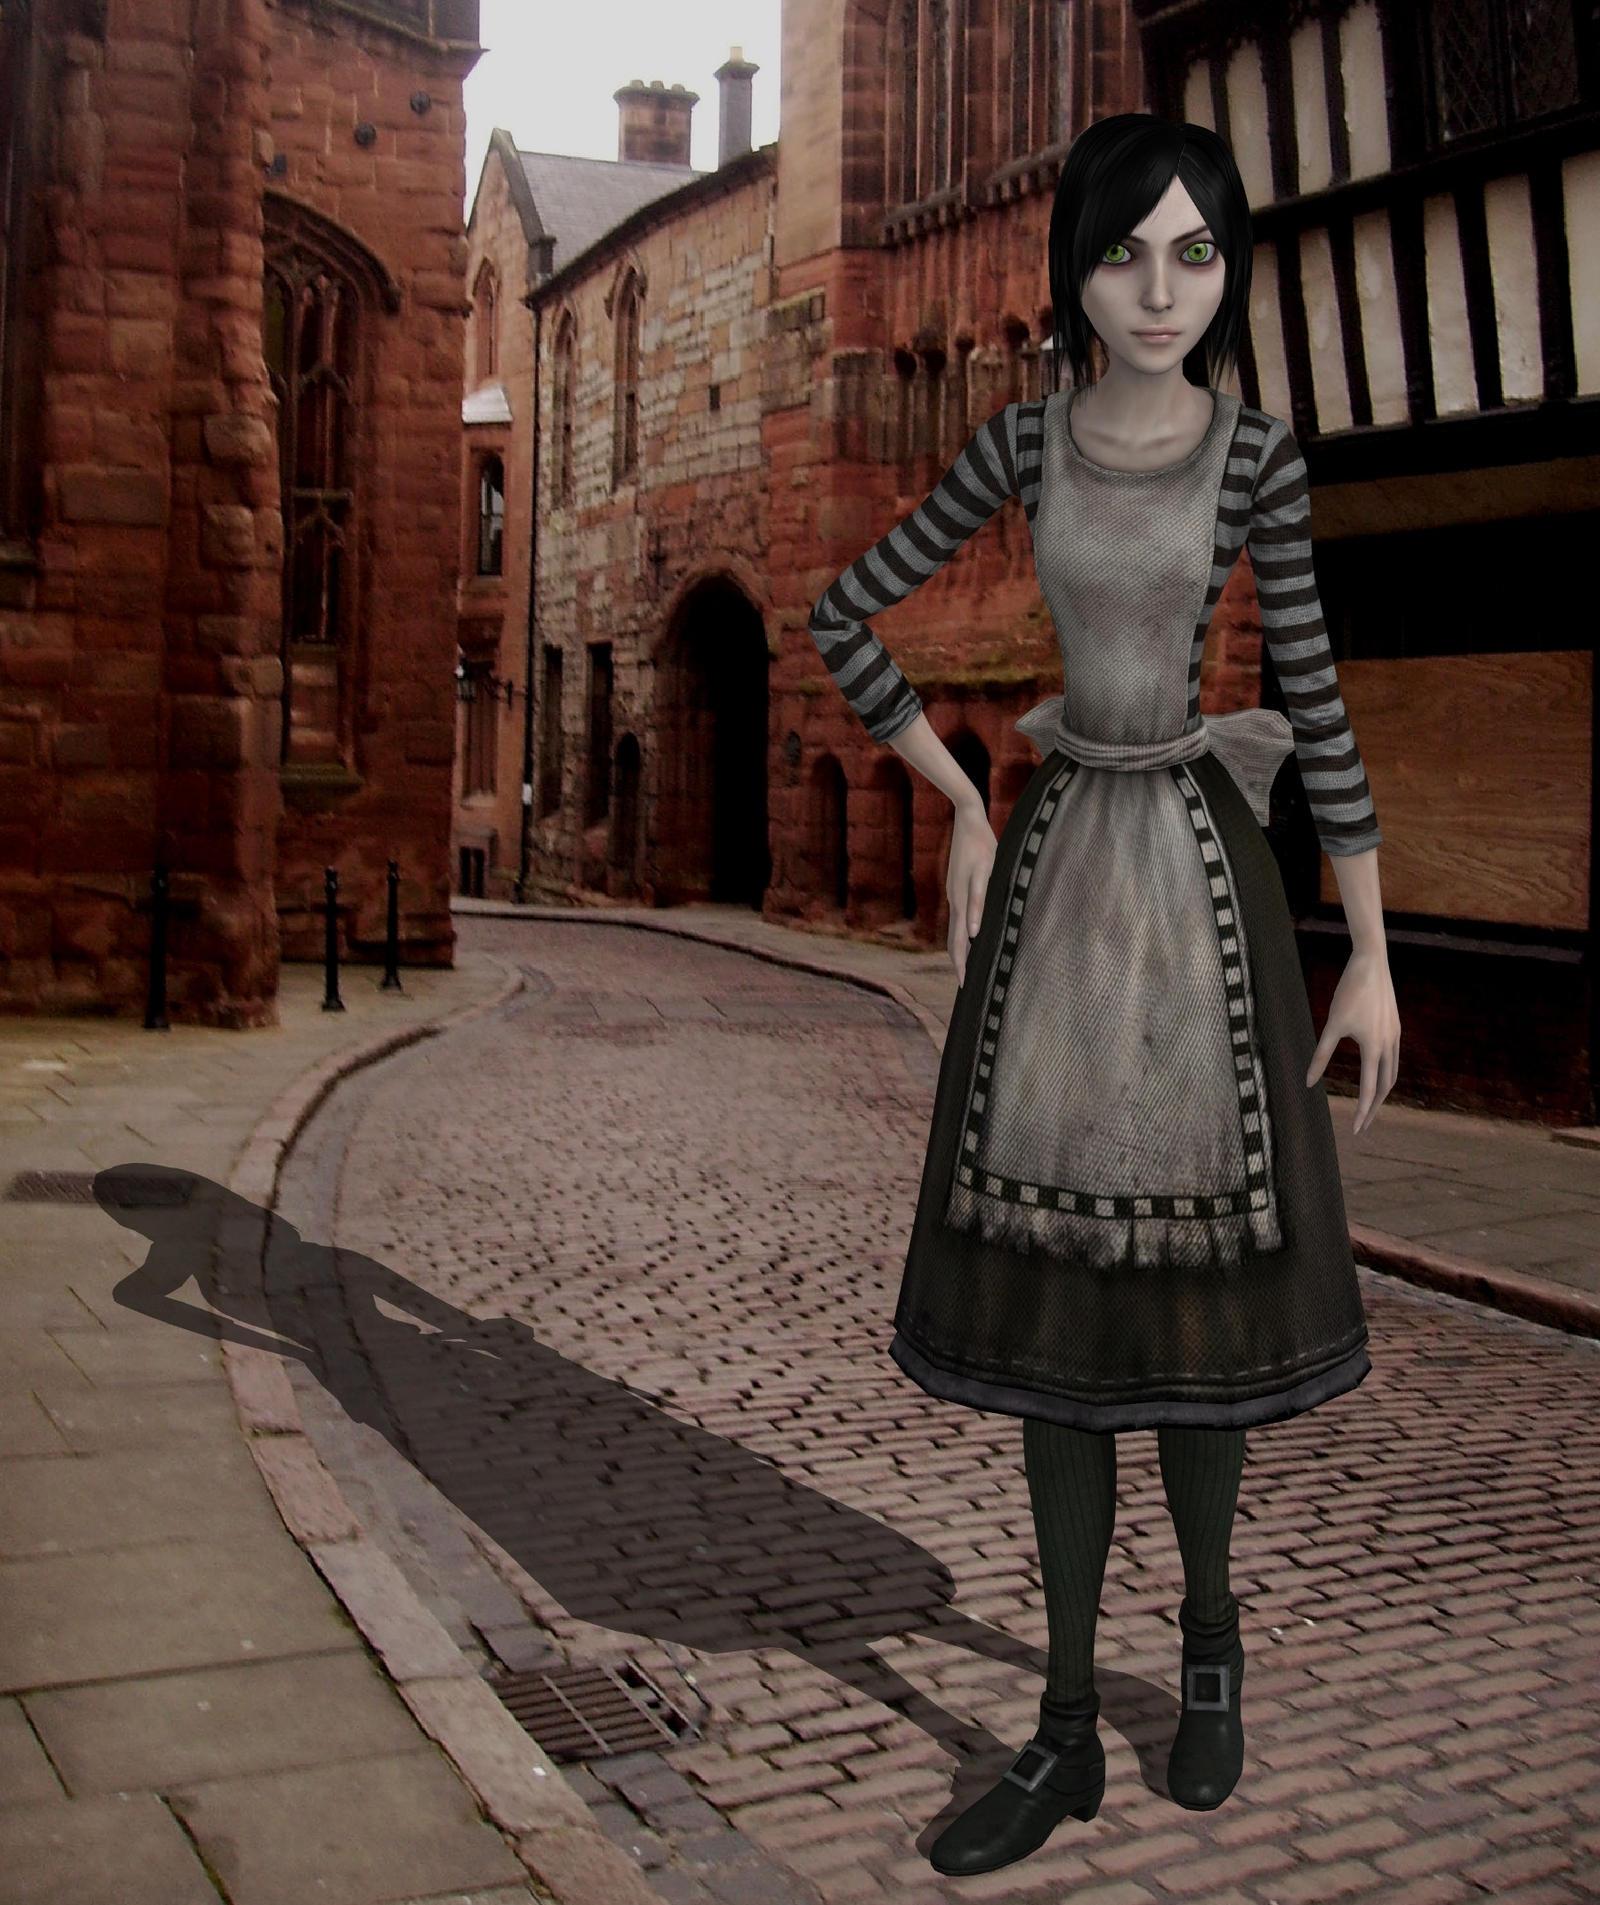 Beautiful Alice by enterprisedavid